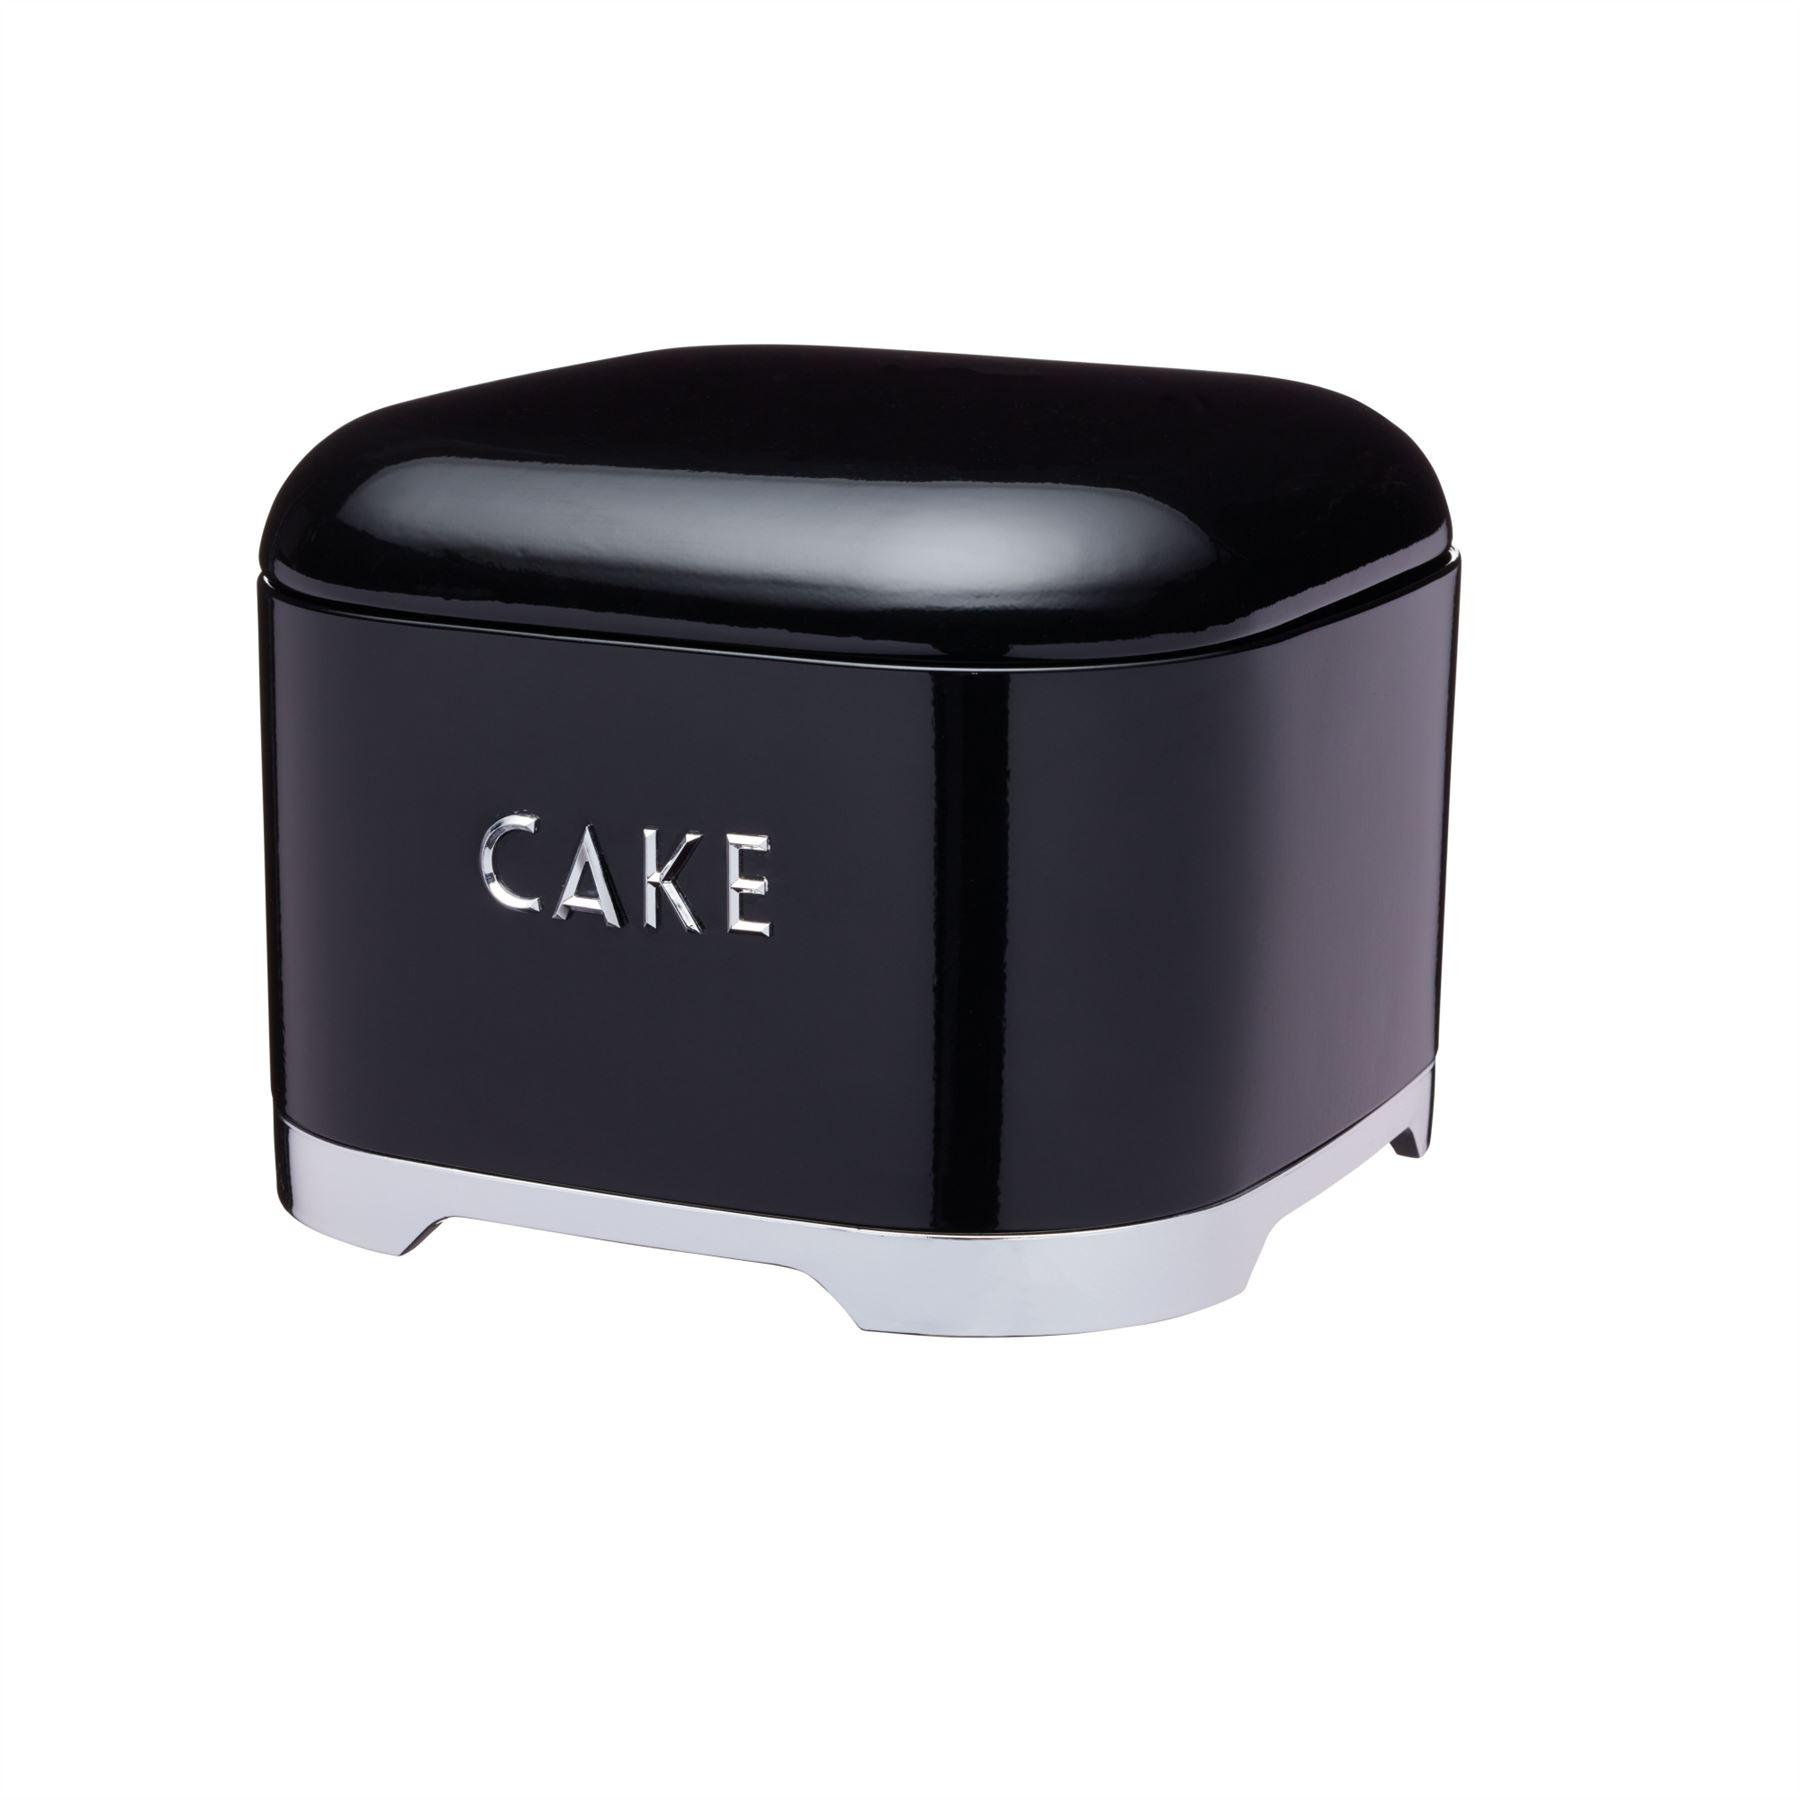 KitchenCraft-Lovello-Cake-Storage-Tin-in-Black-Red-or-Cream